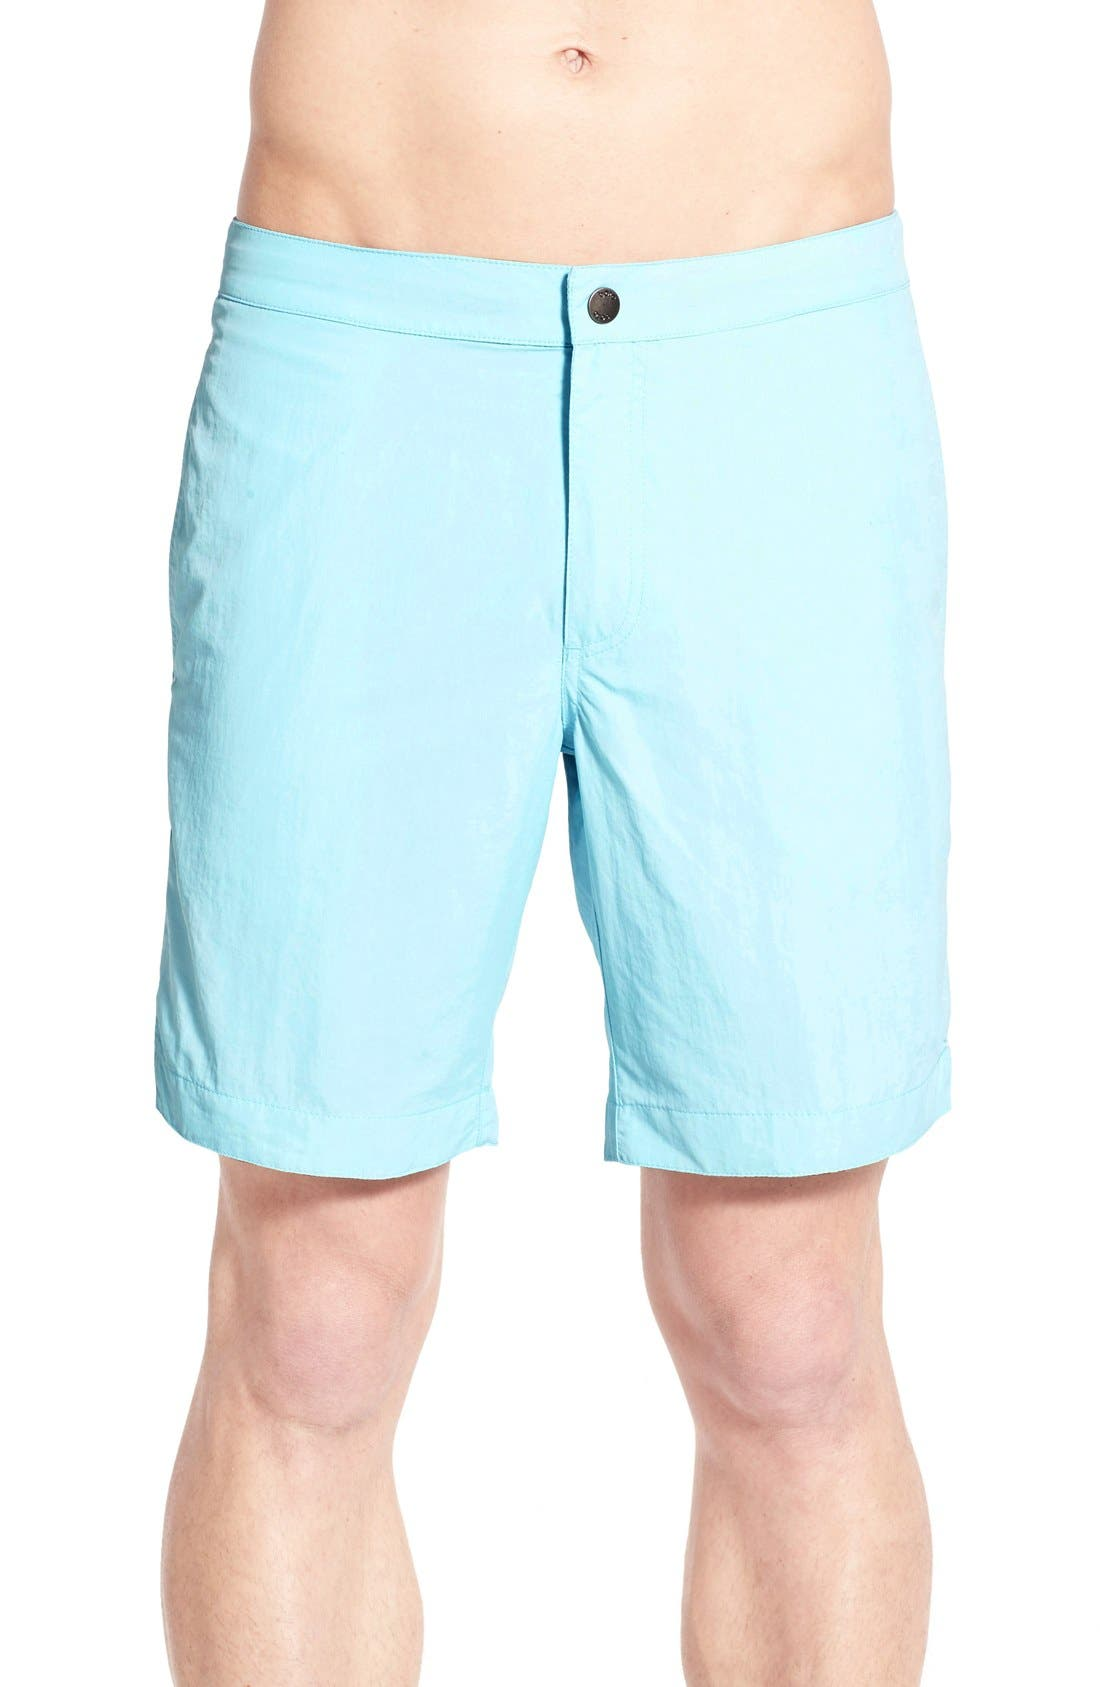 Vintage Men's Swimsuits – 1930s to 1970s History Mens Boto Aruba Tailored Fit Swim Trunks Size 38 - Blue $69.00 AT vintagedancer.com